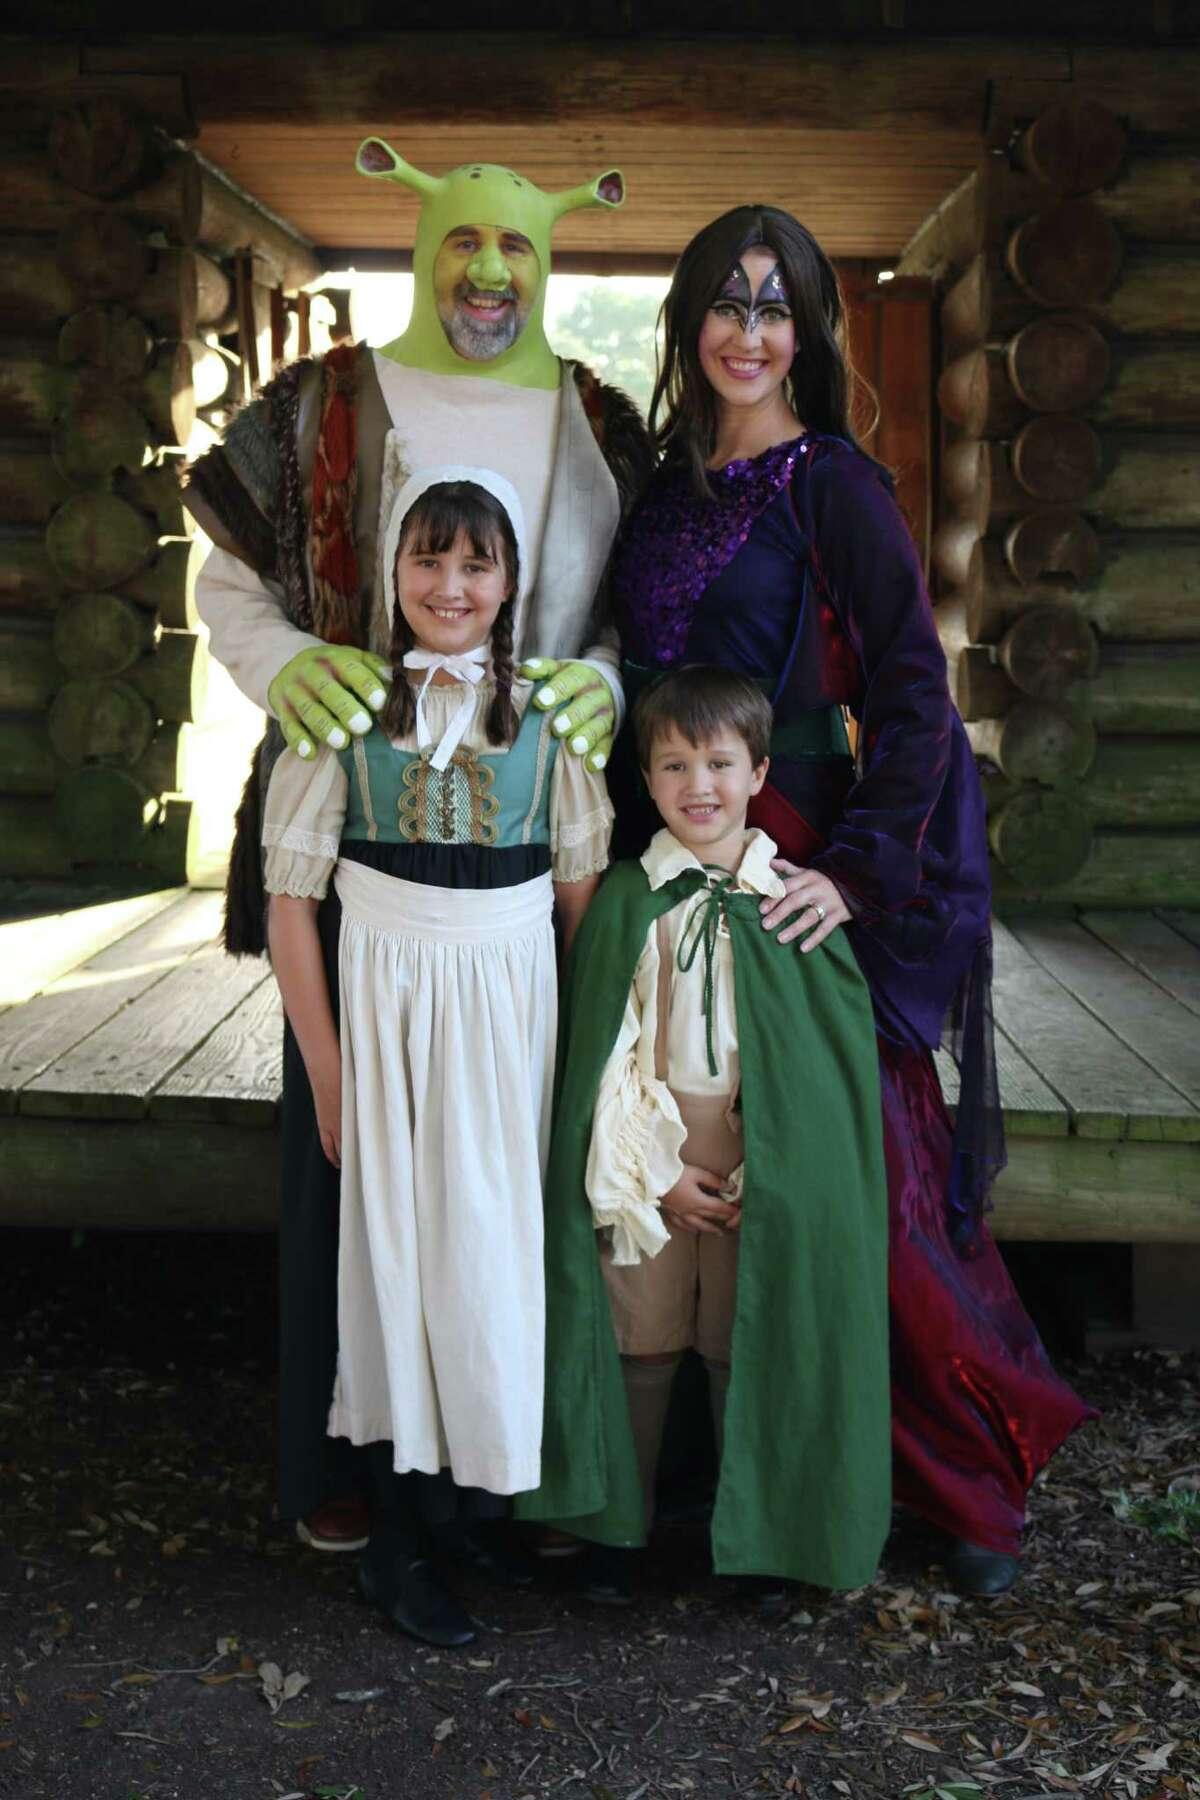 It S A Family Affair In Shrek The Musical